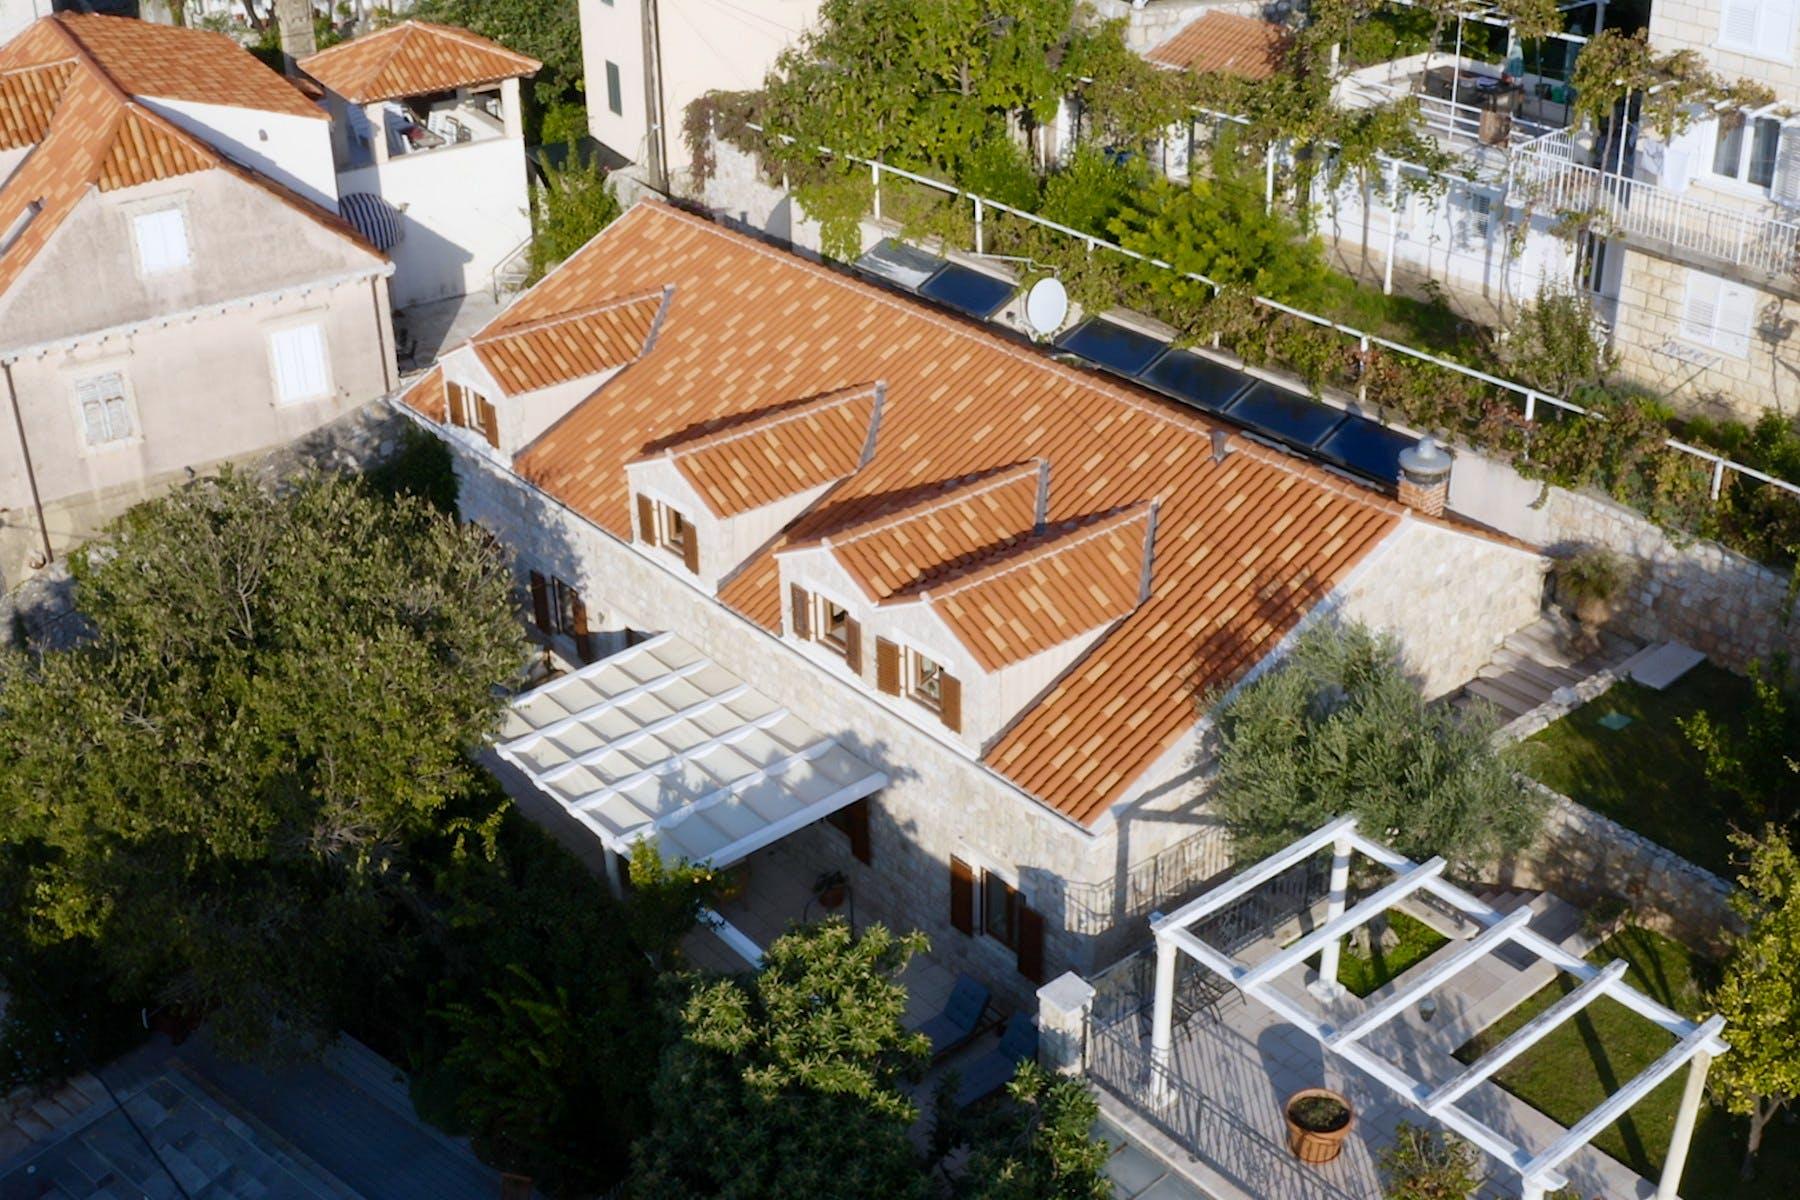 Unique stone villa surrounded by lush Mediterranean garden